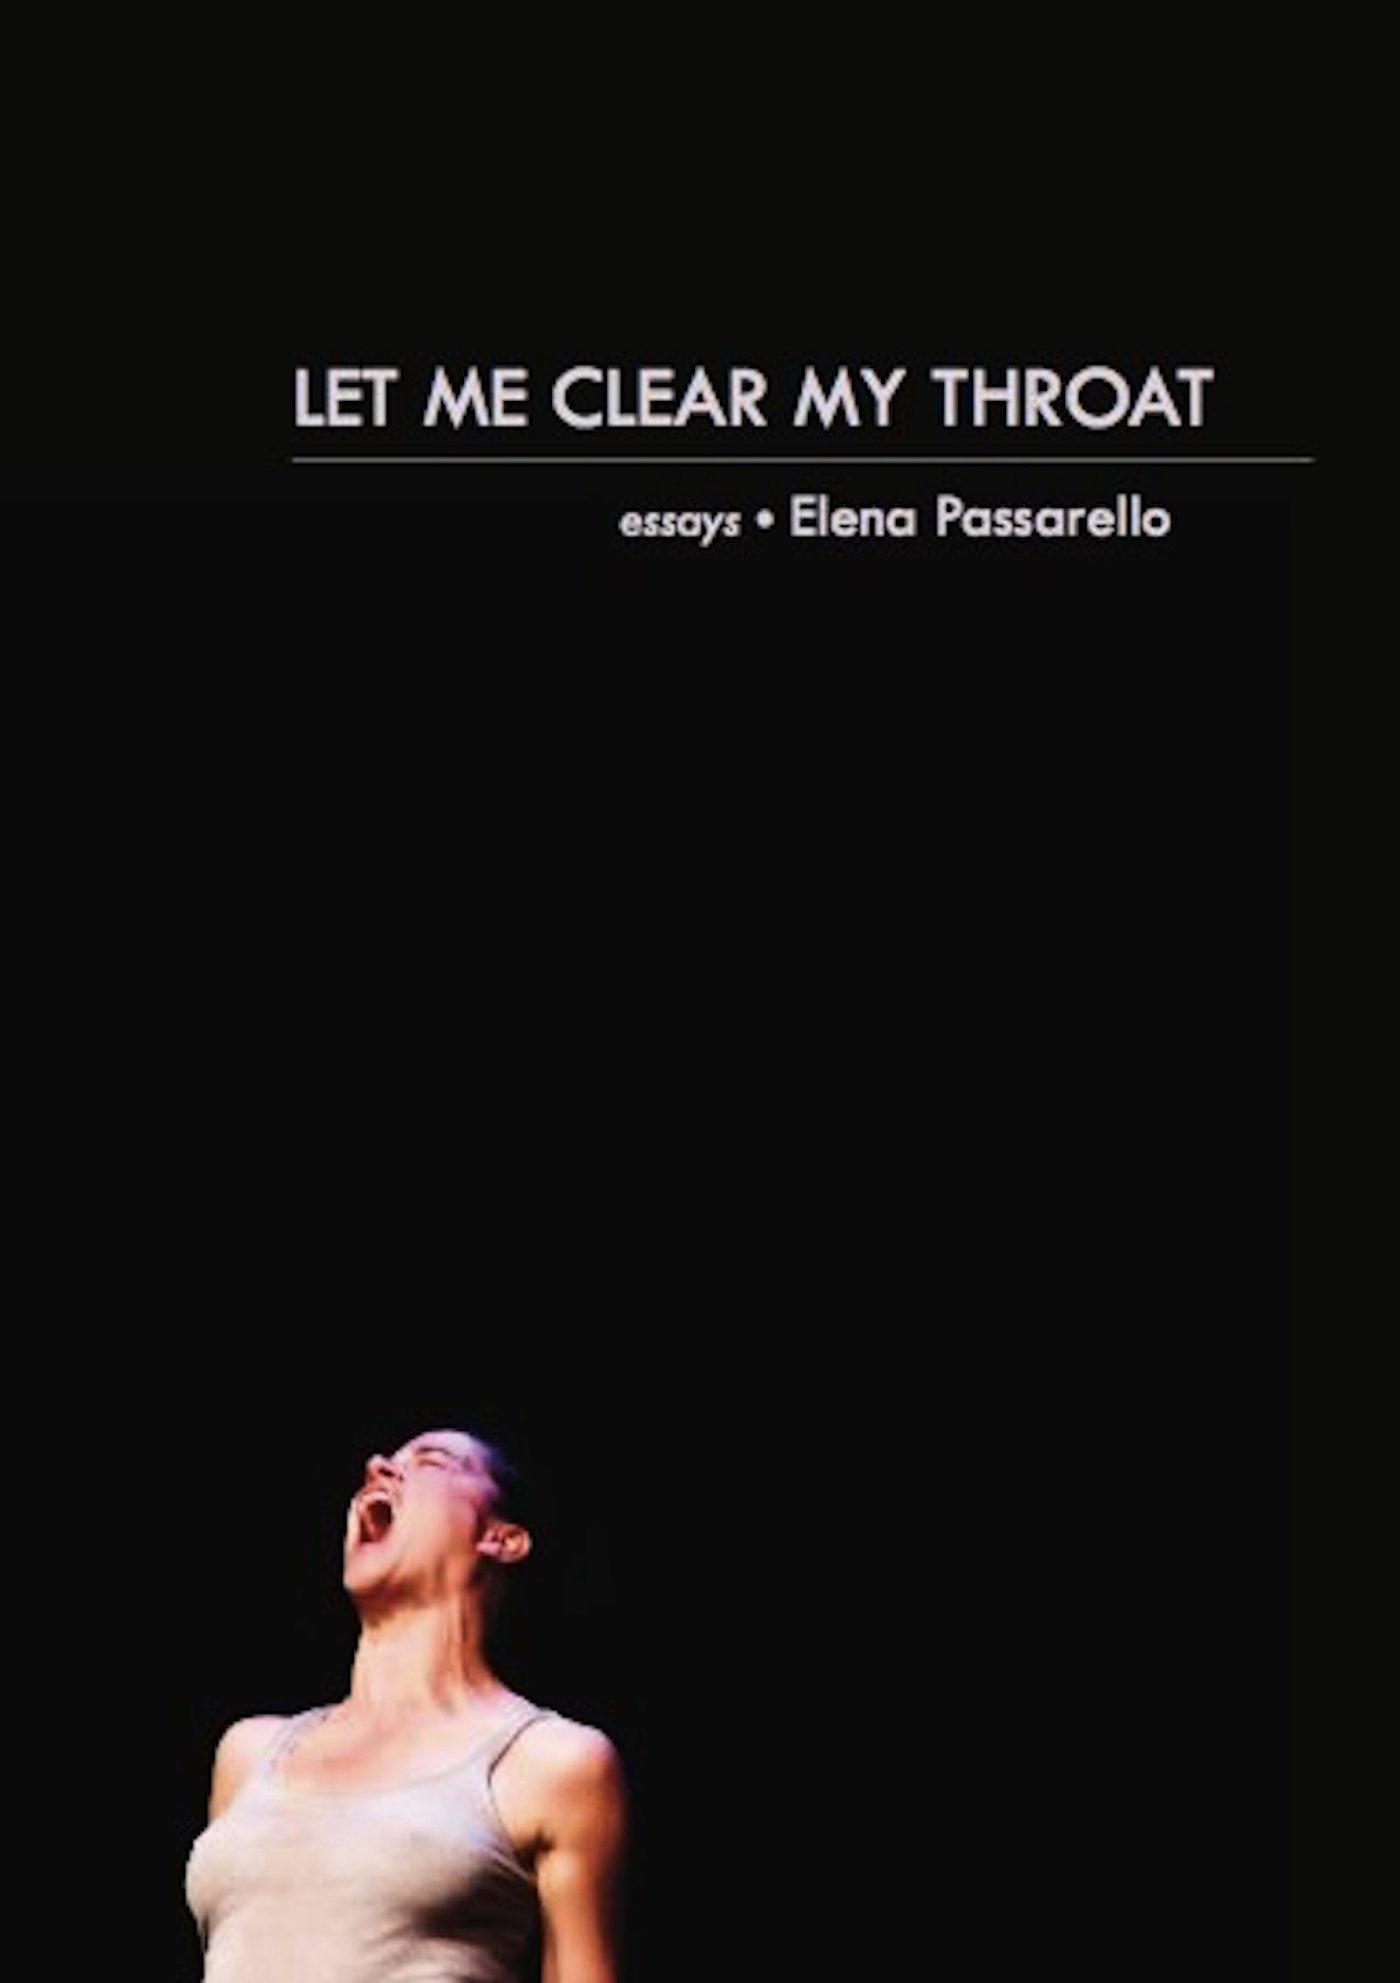 let me clear my throat essays elena passarello  let me clear my throat essays elena passarello 9781936747450 com books